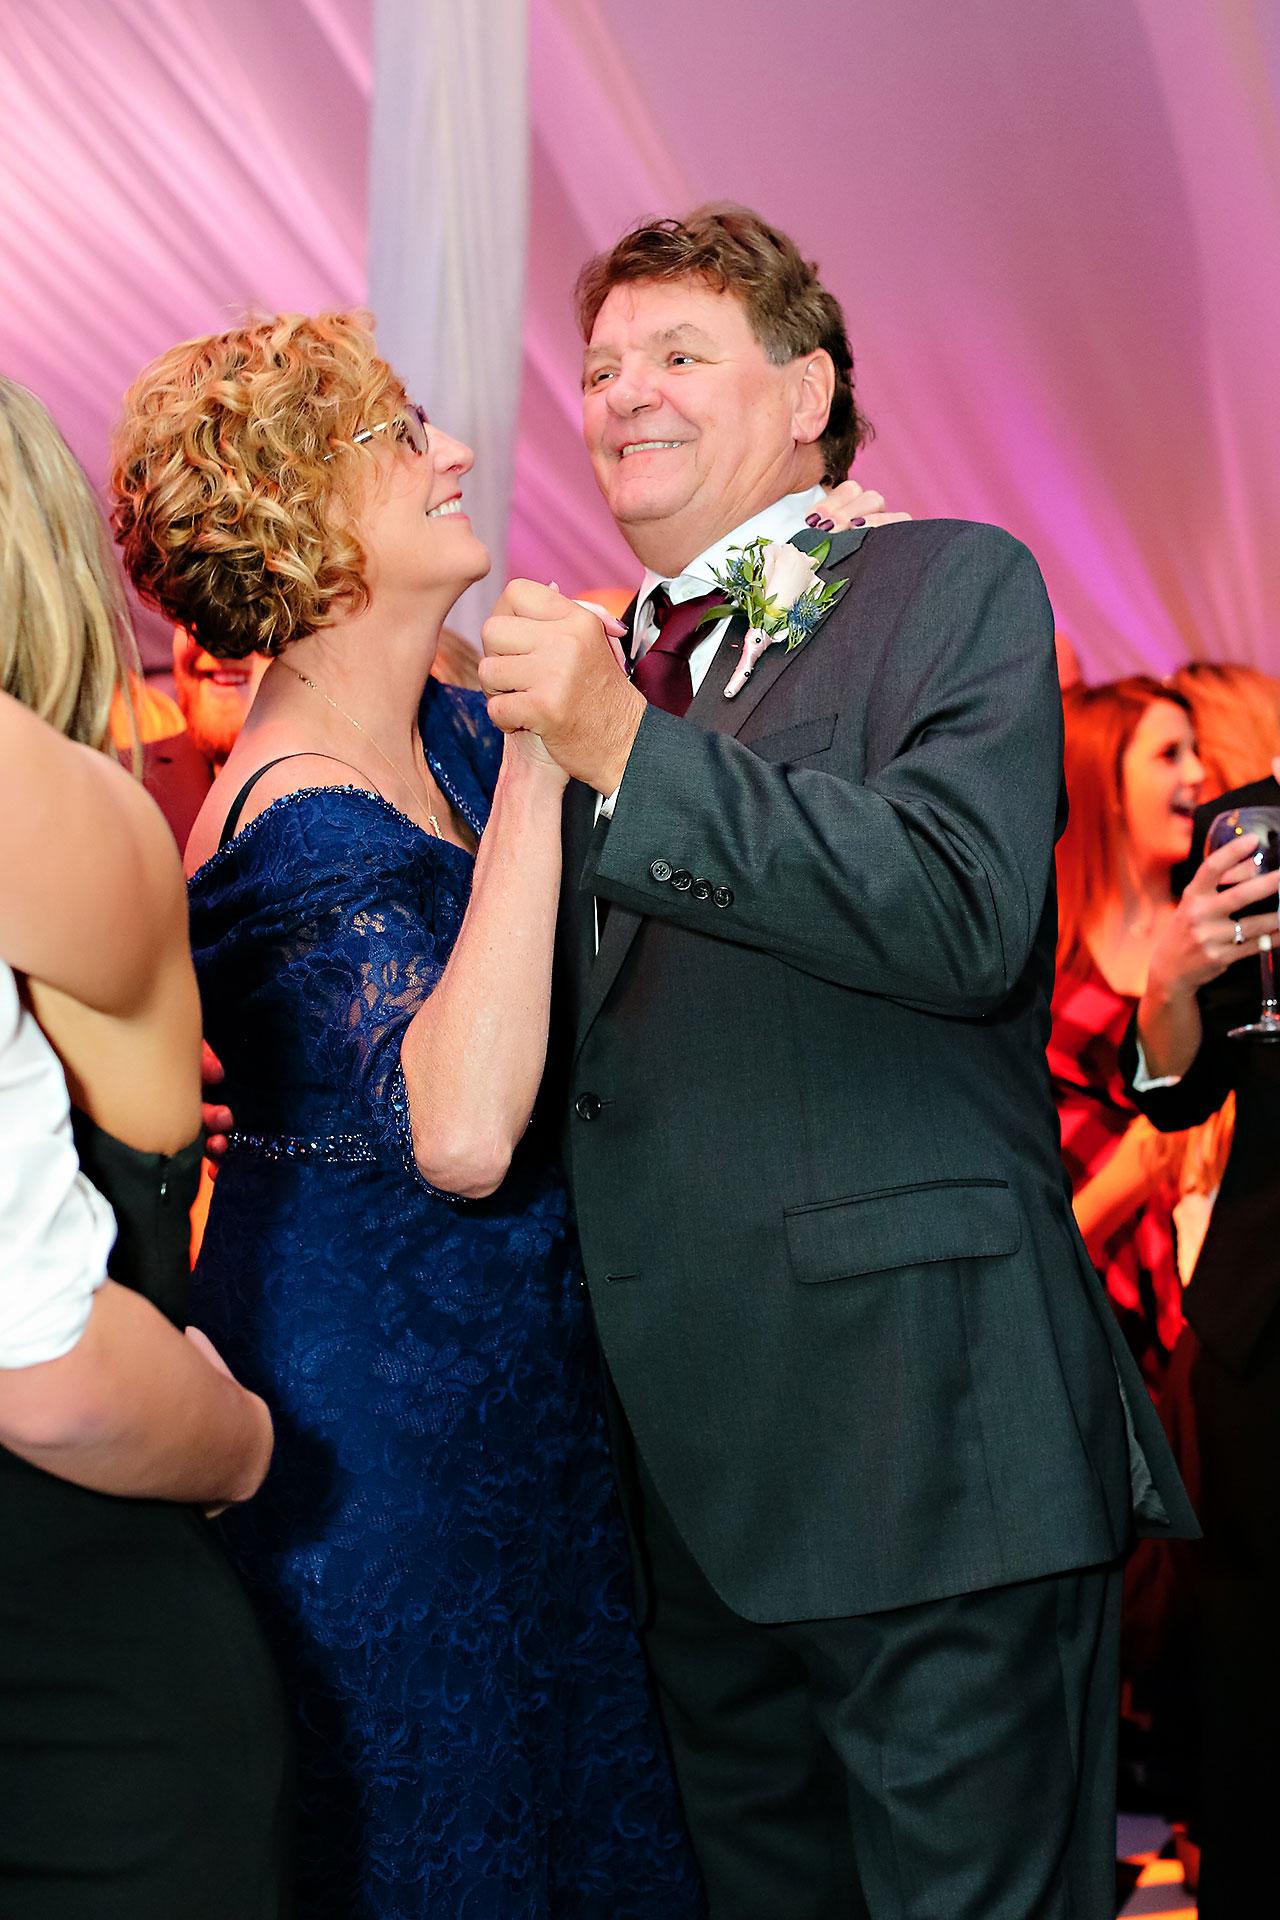 Ashley Steve Bloomington Indiana Wedding 372